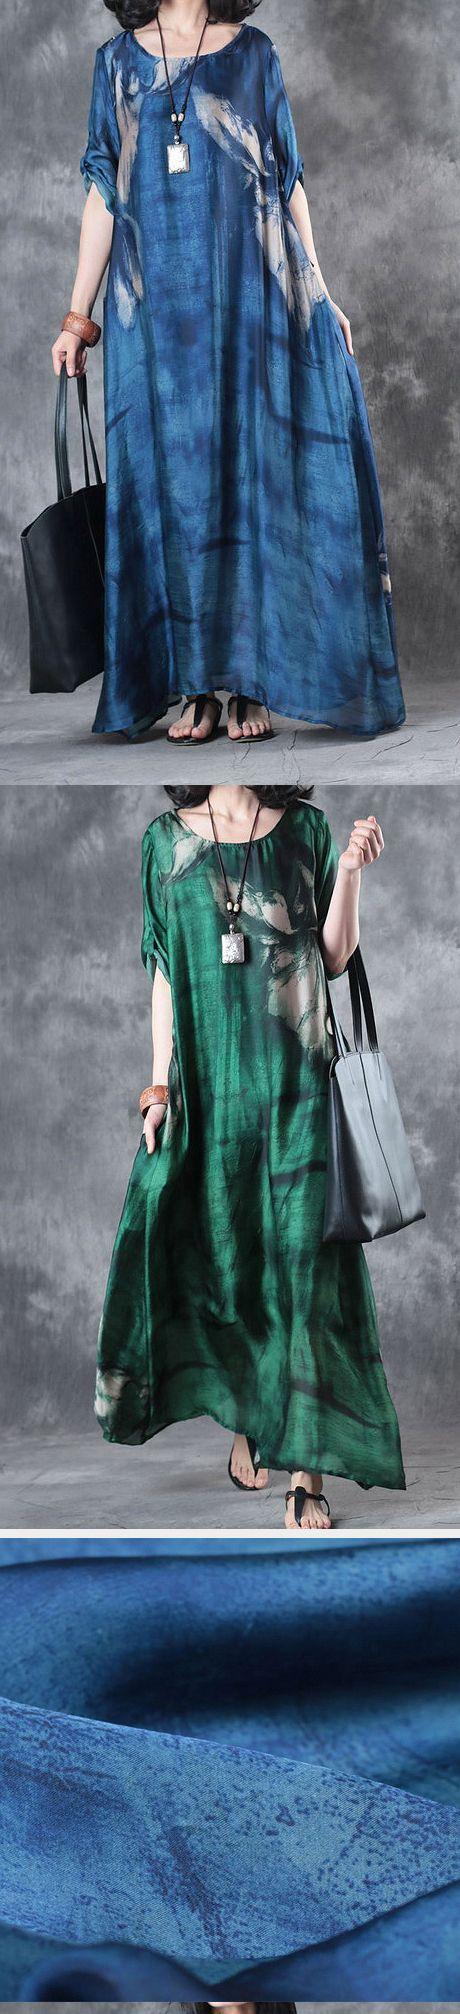 blue print silk dresses oversize draping sundress short sleeve maxi dress